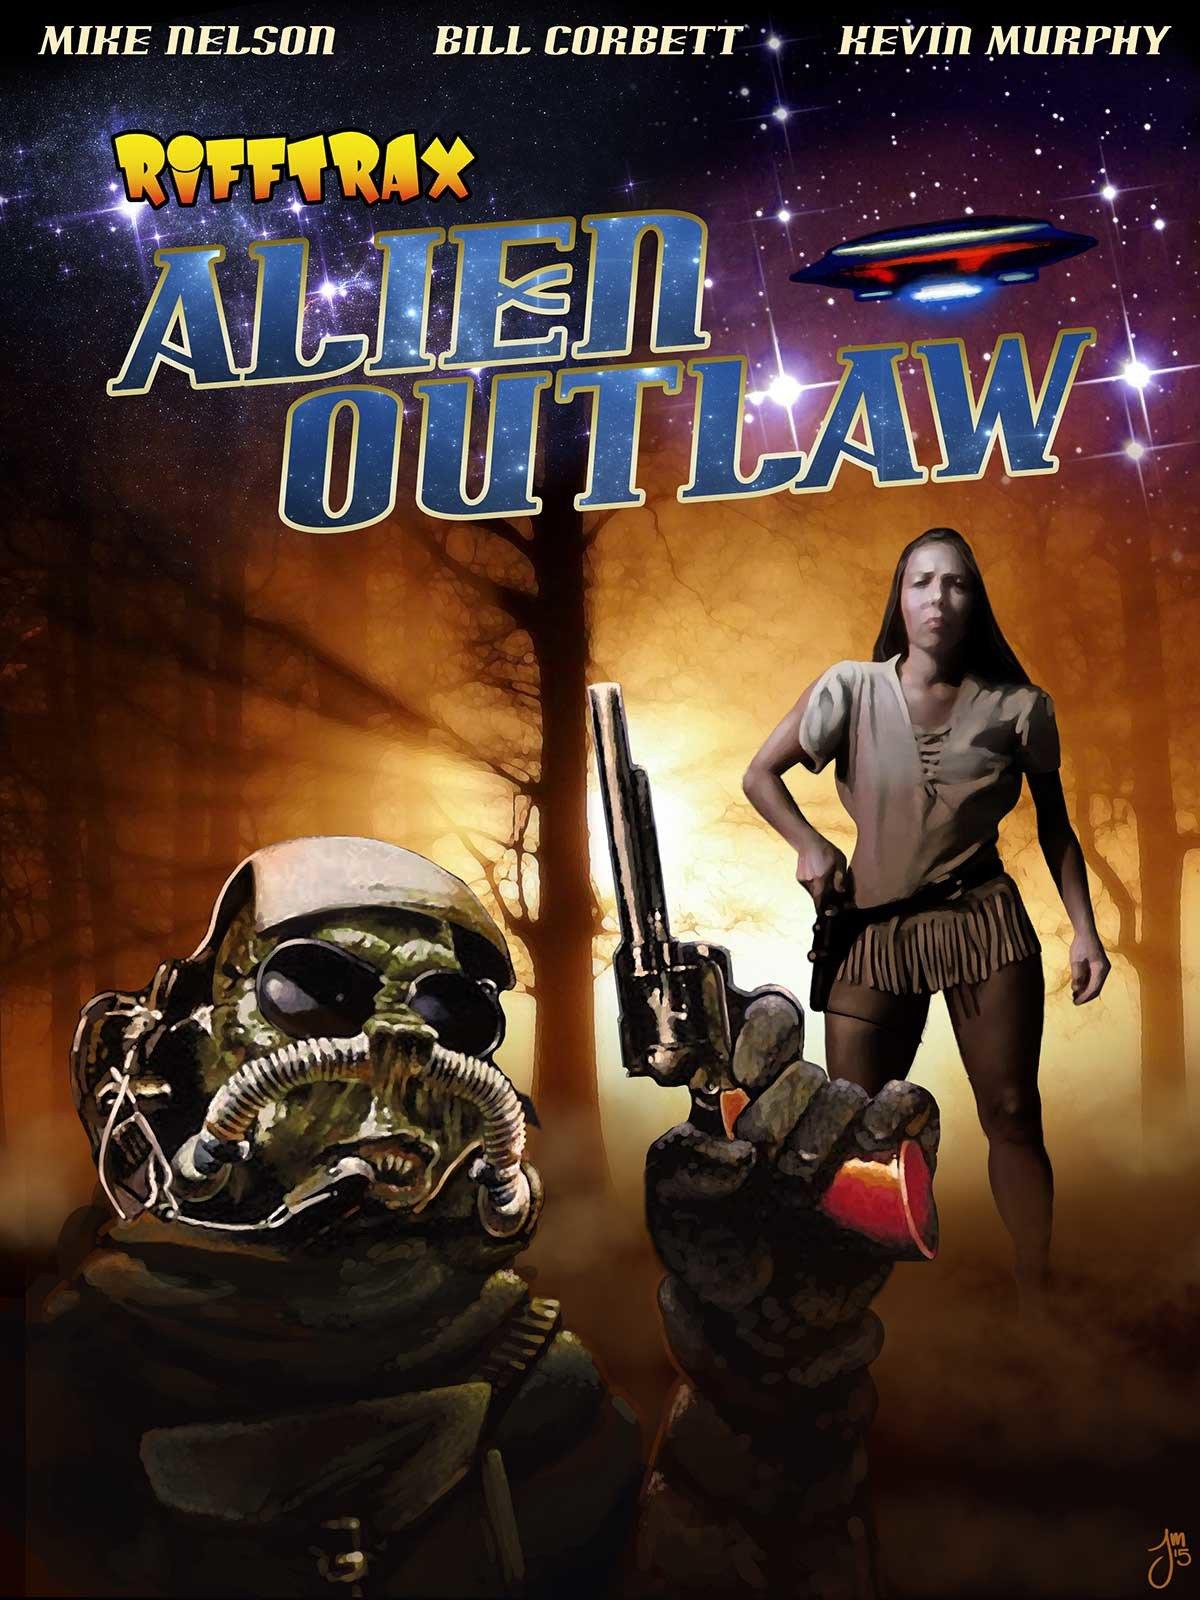 RiffTrax: Alien Outlaw